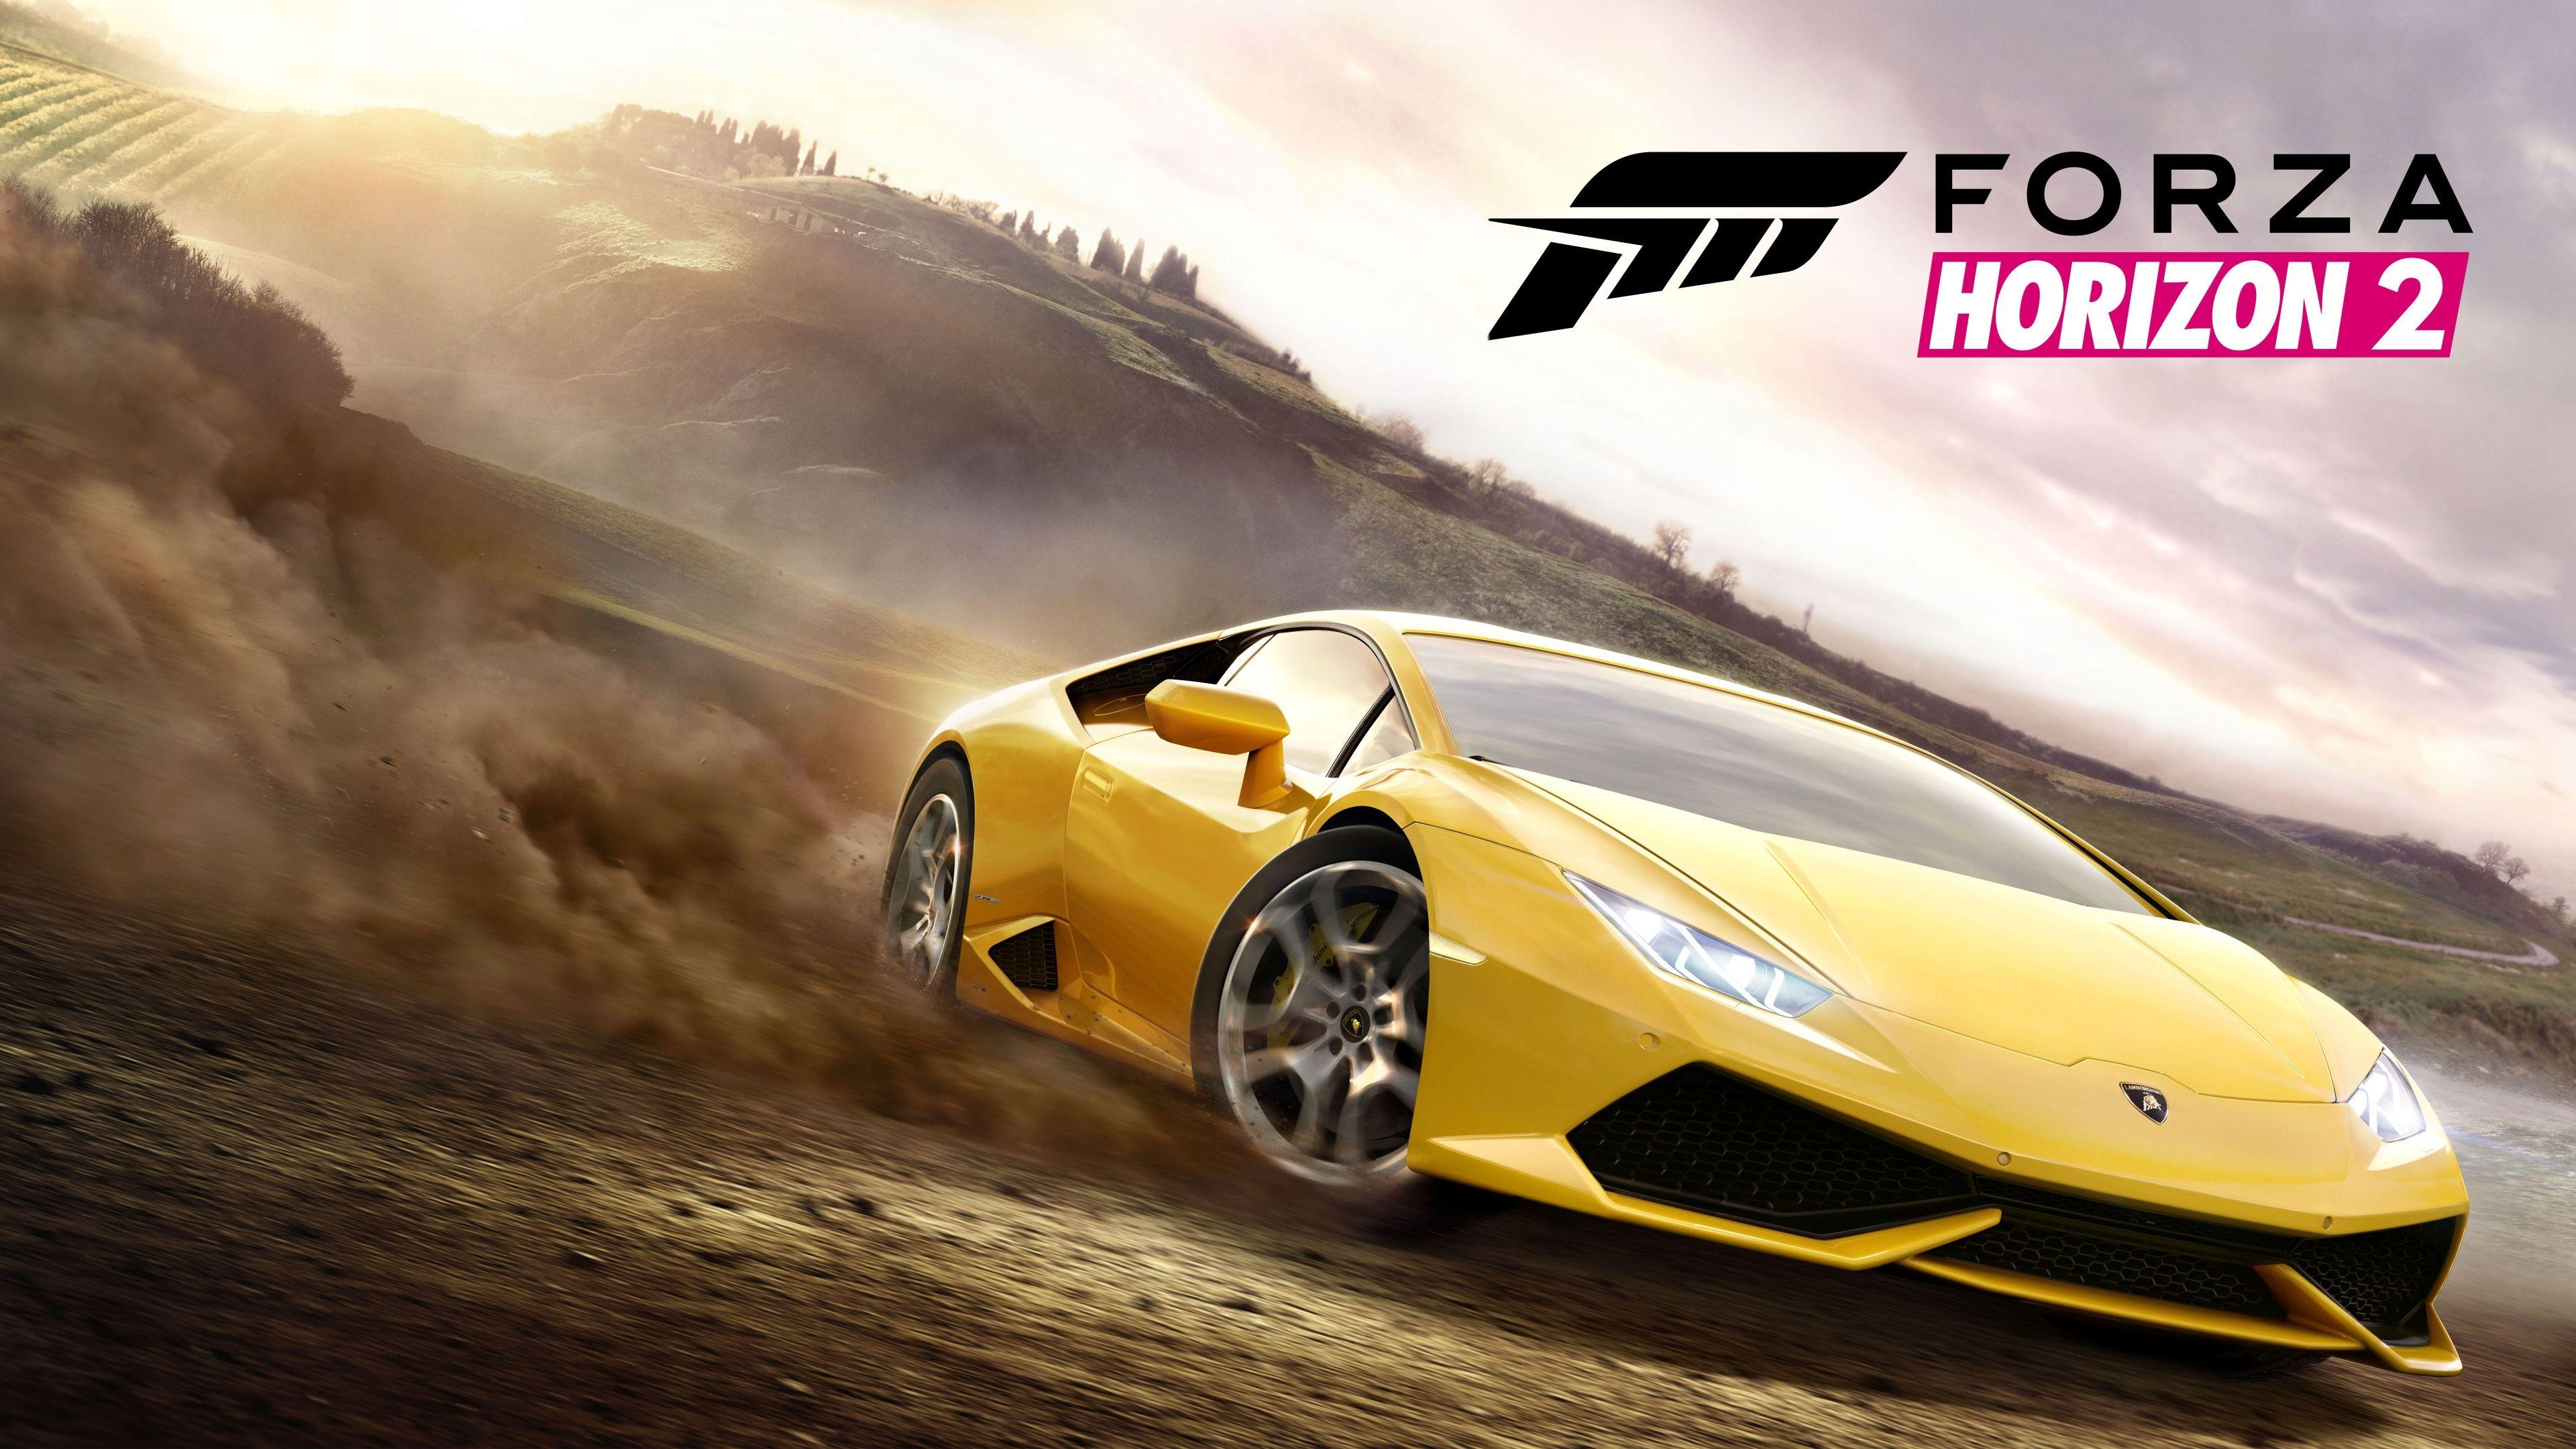 3840x2160 Forza Horizon 2 4k Awesome Wallpaper Forza Horizon Forza Horizon 3 Forza Motorsport